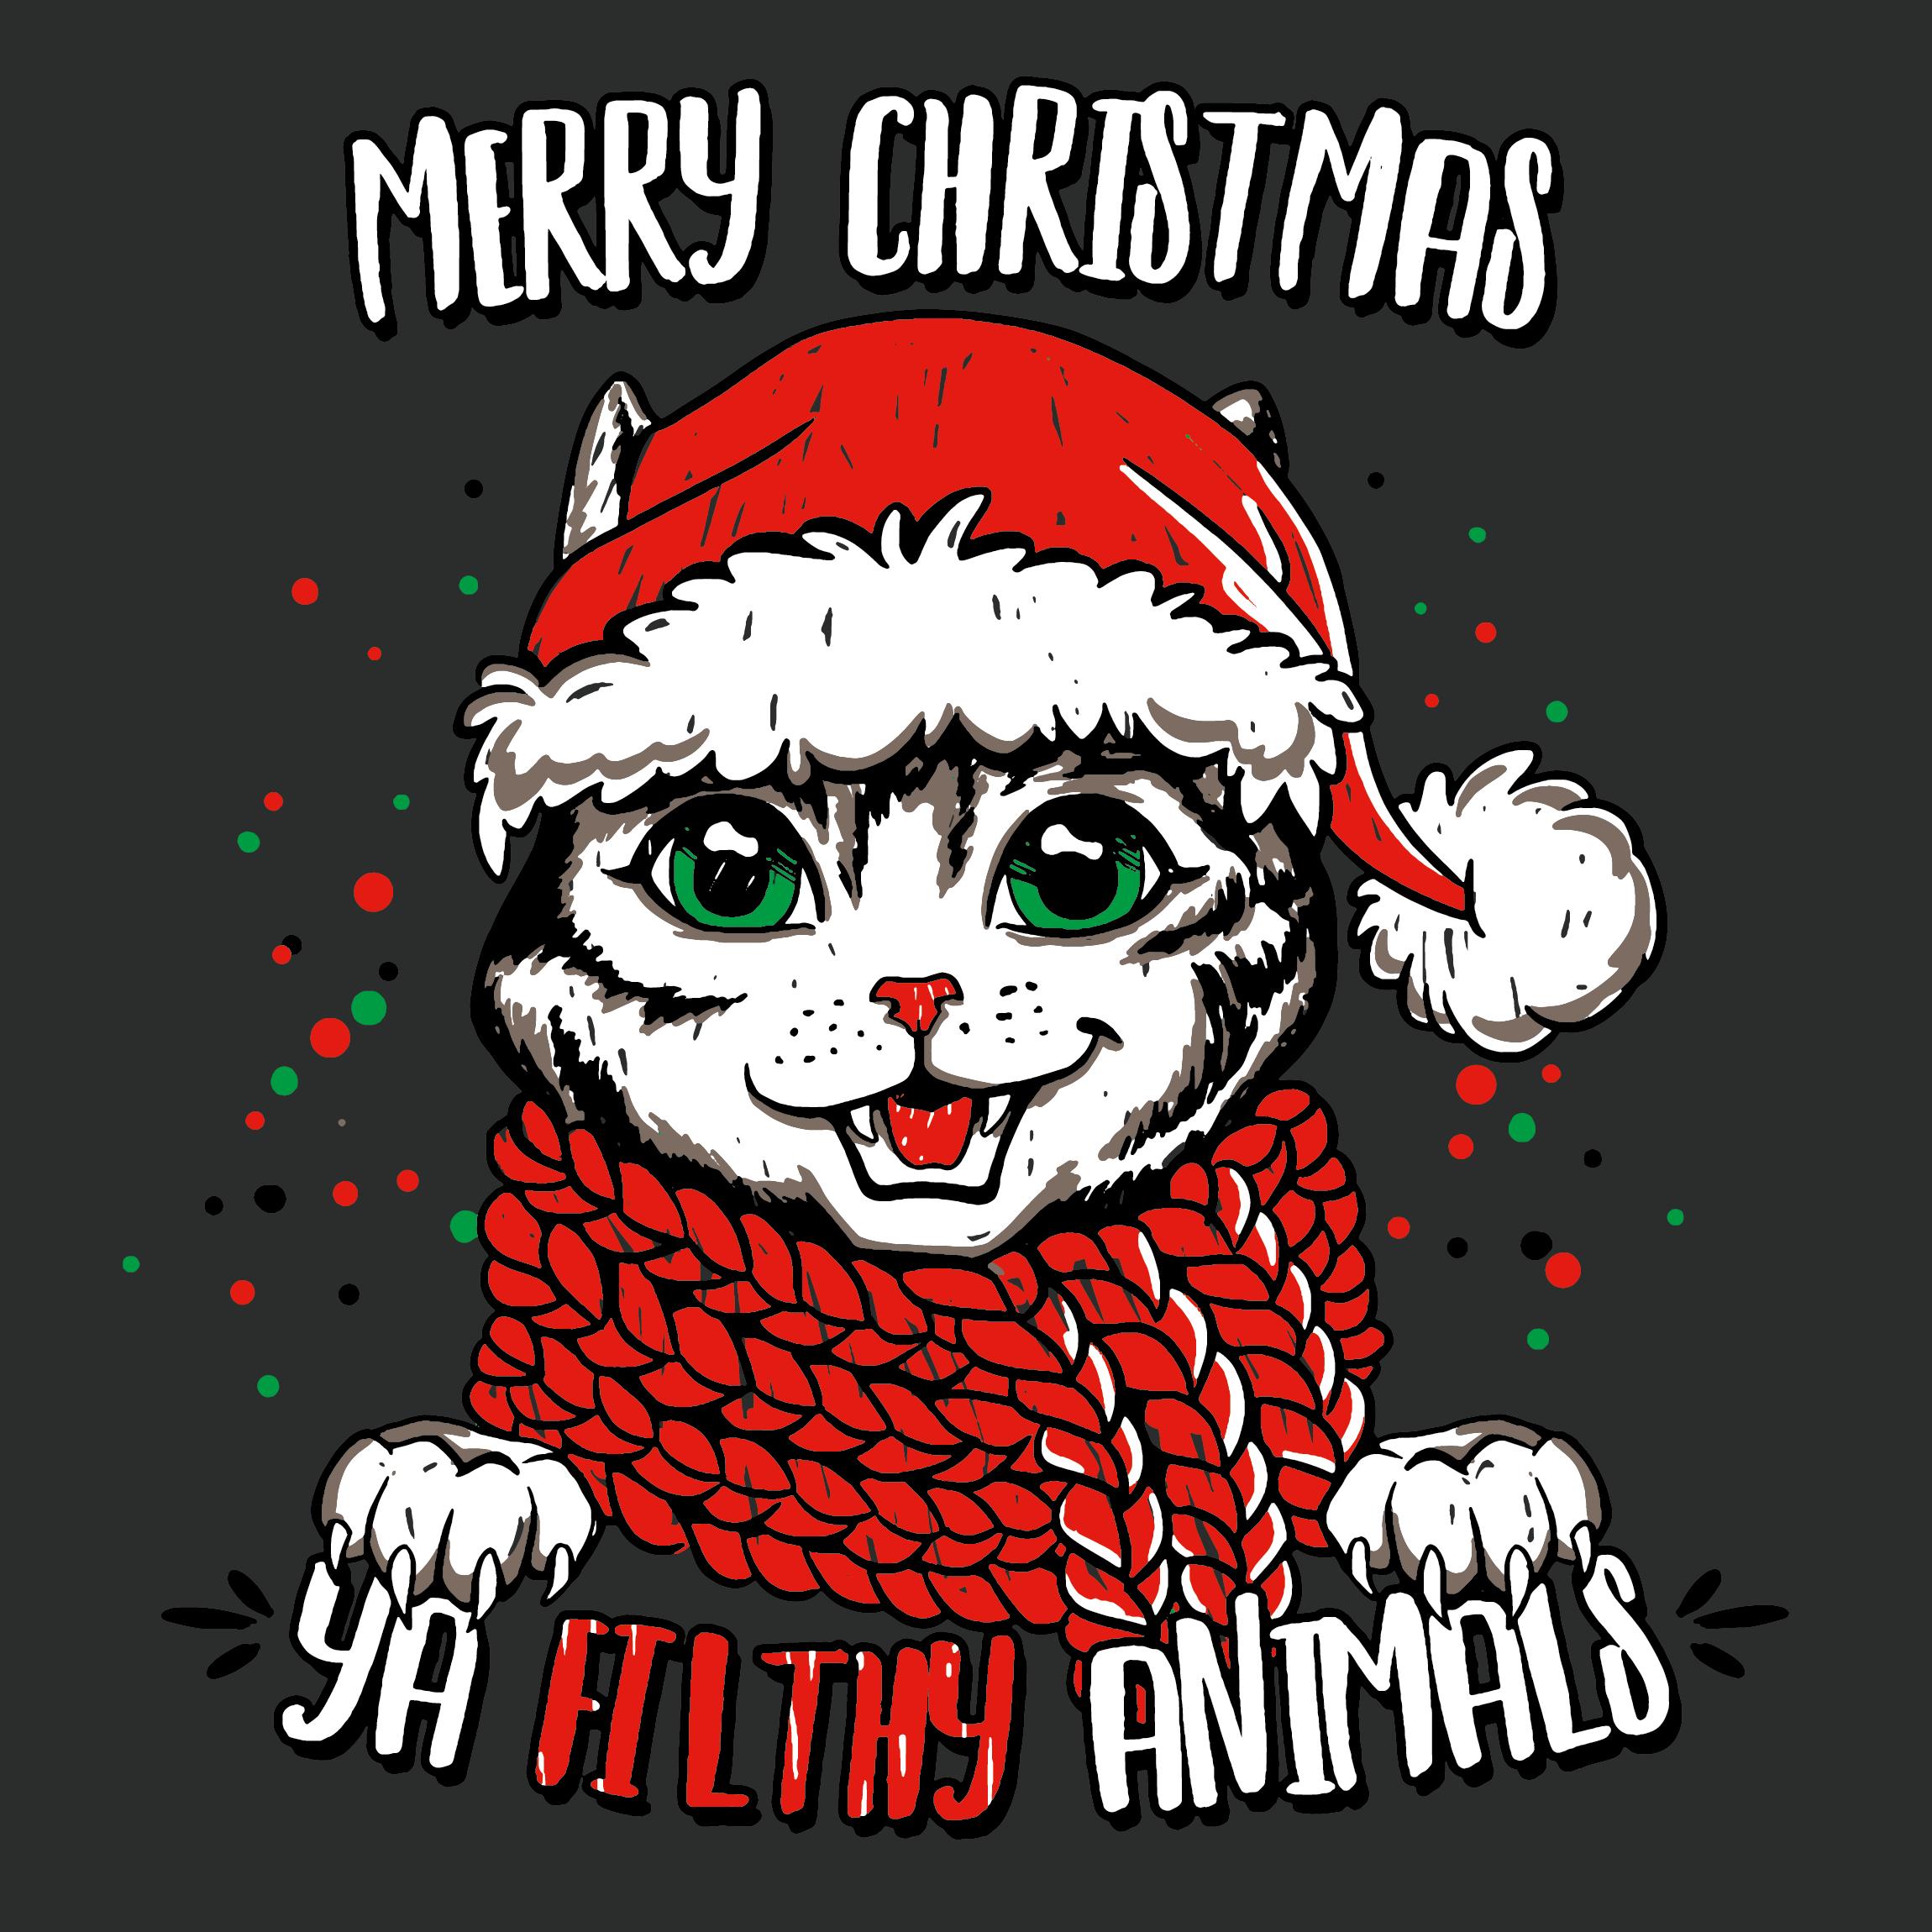 MERRY CHRISTMAS YA FILTHY ANIMALS (Cat & dog Christmas Shirt Design)